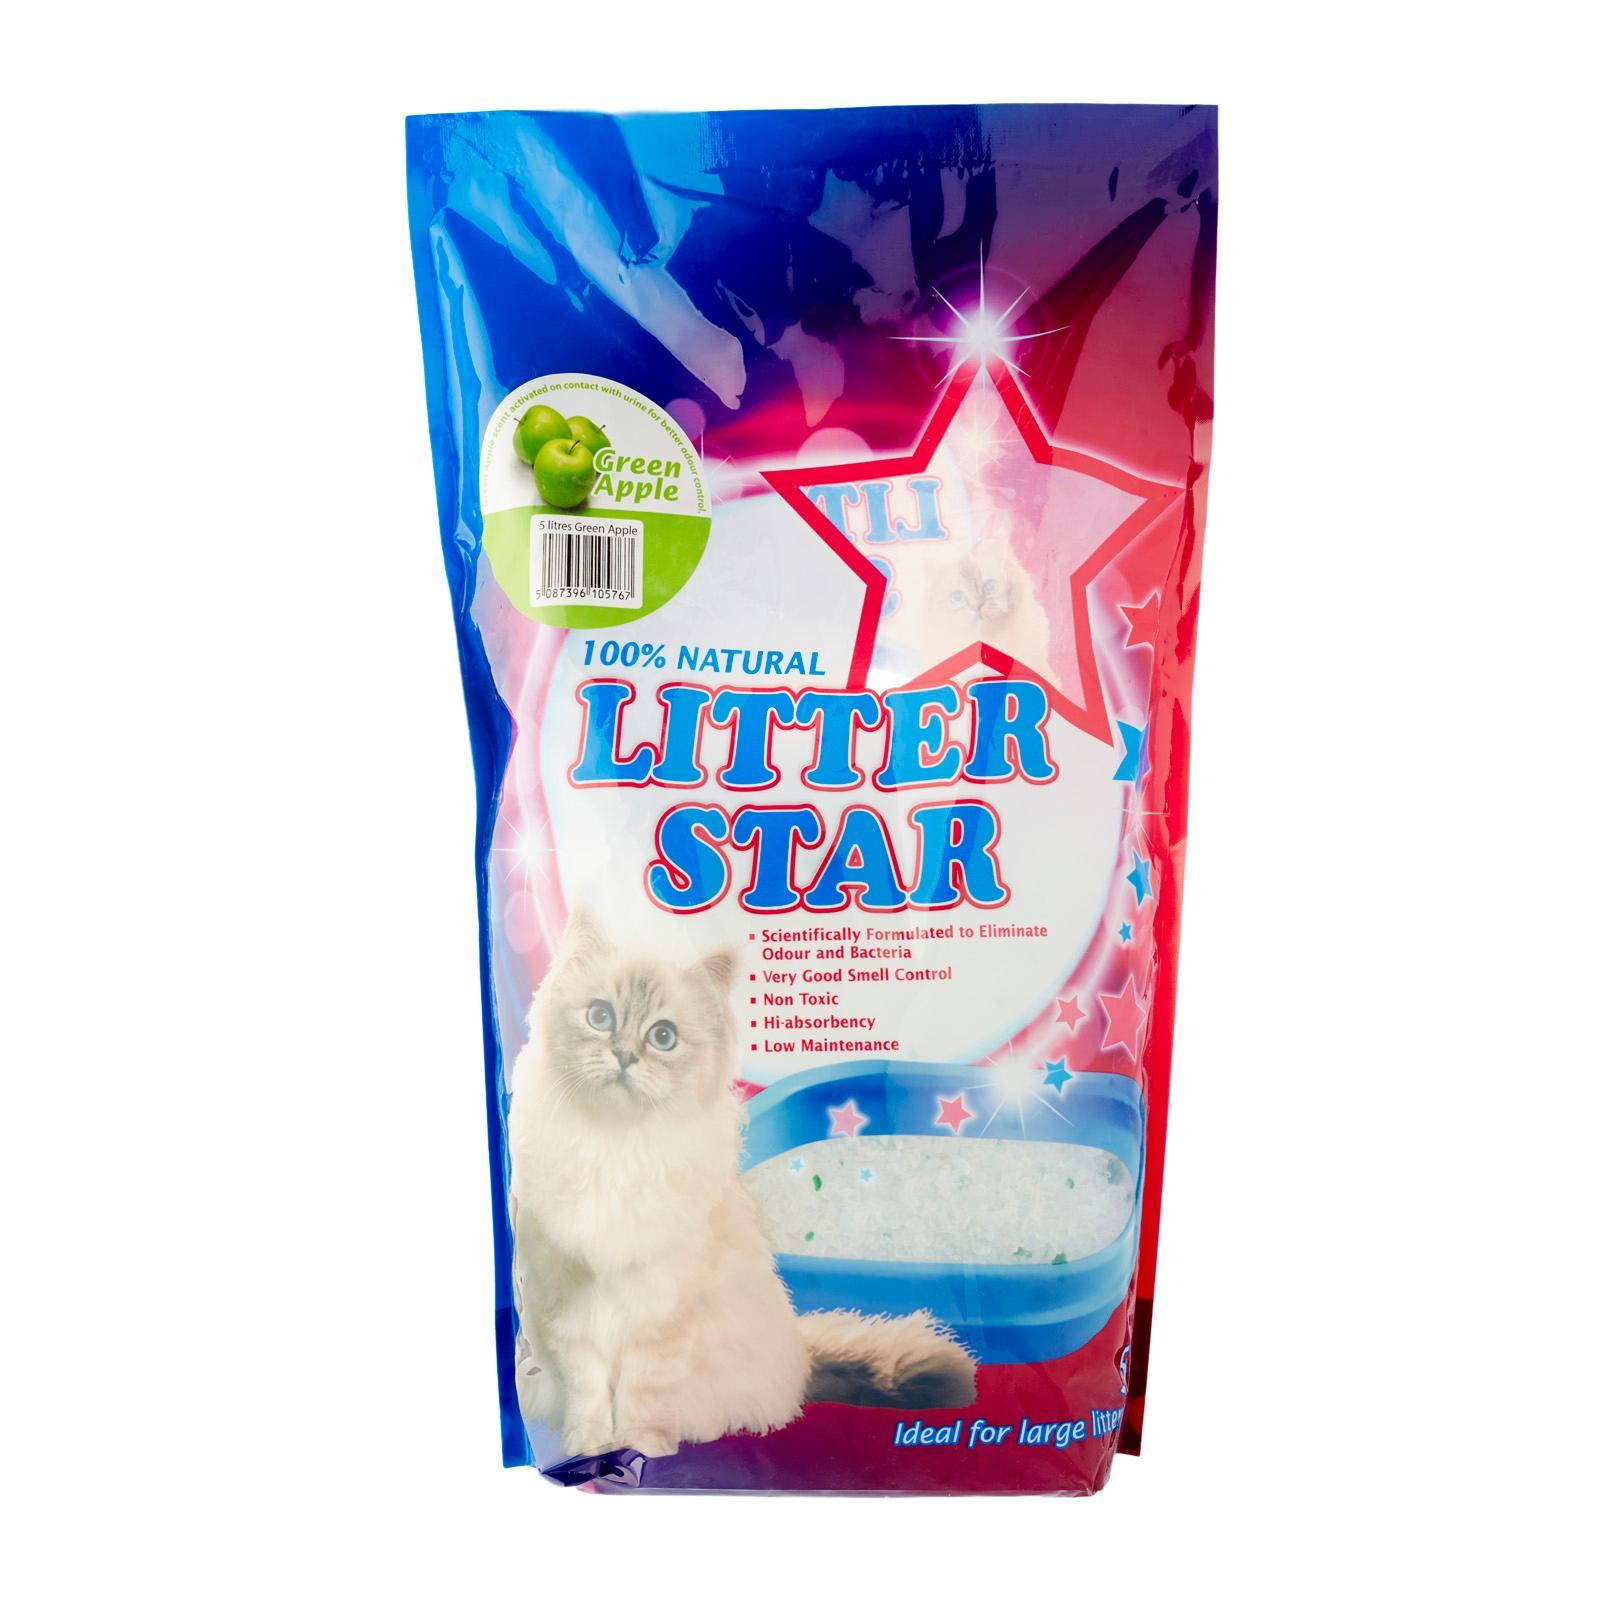 LITTER STAR Green Apple Crystal Cat Litter